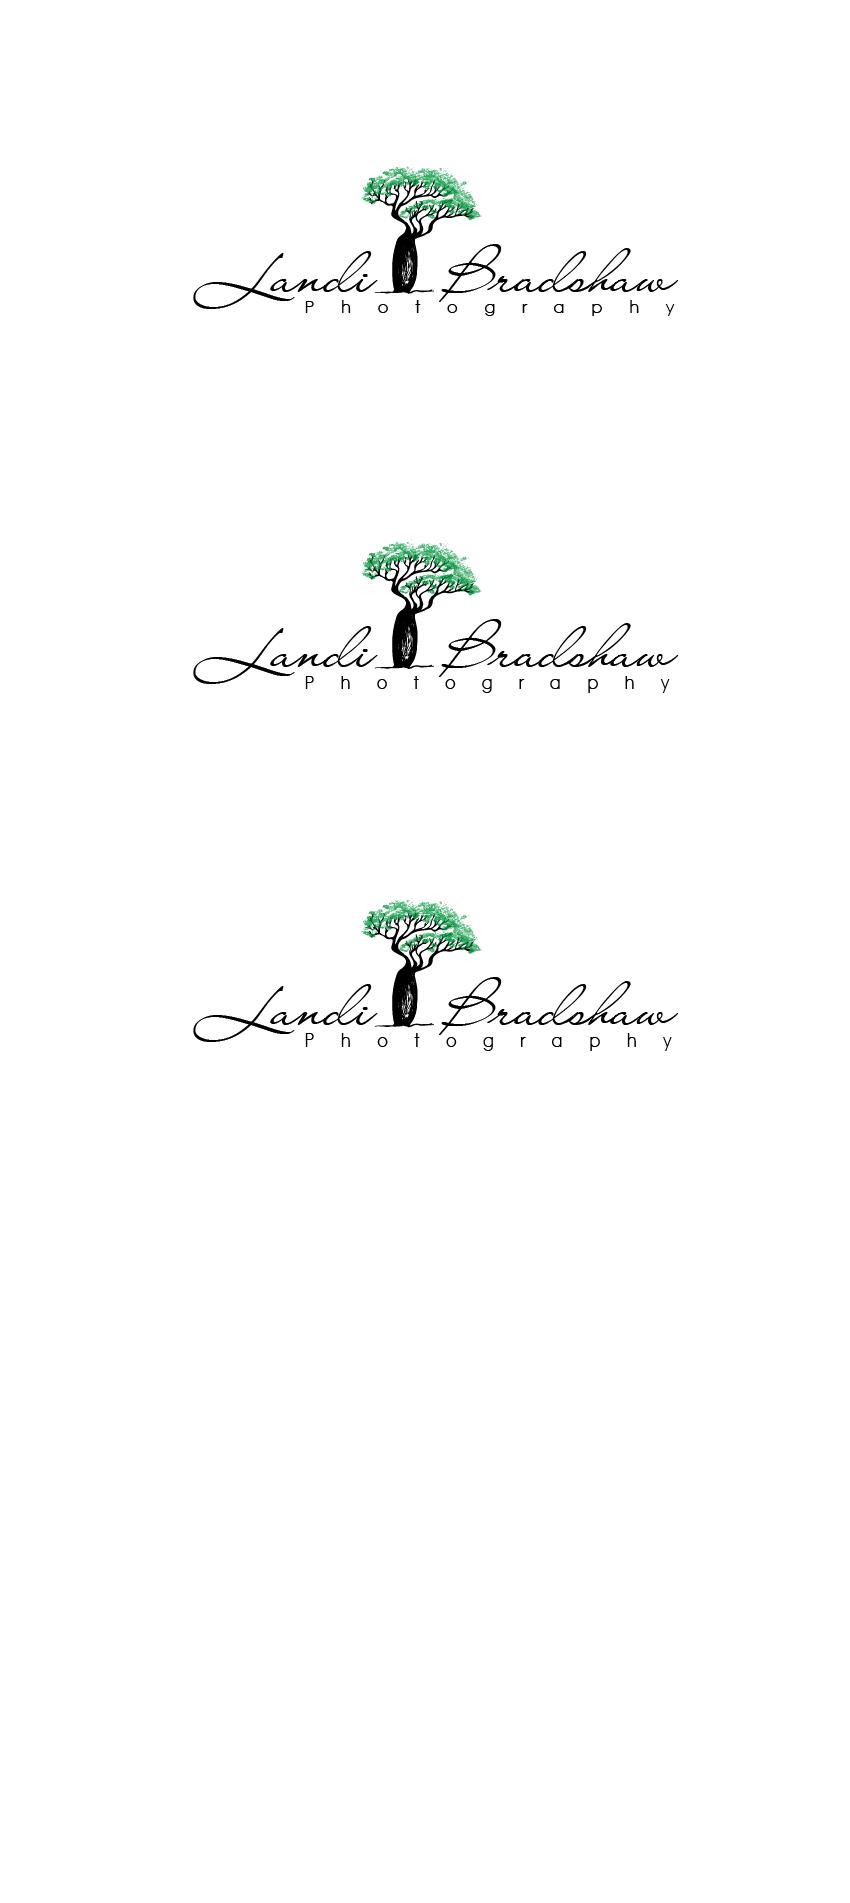 Logo Needed: Tree + Signature Based